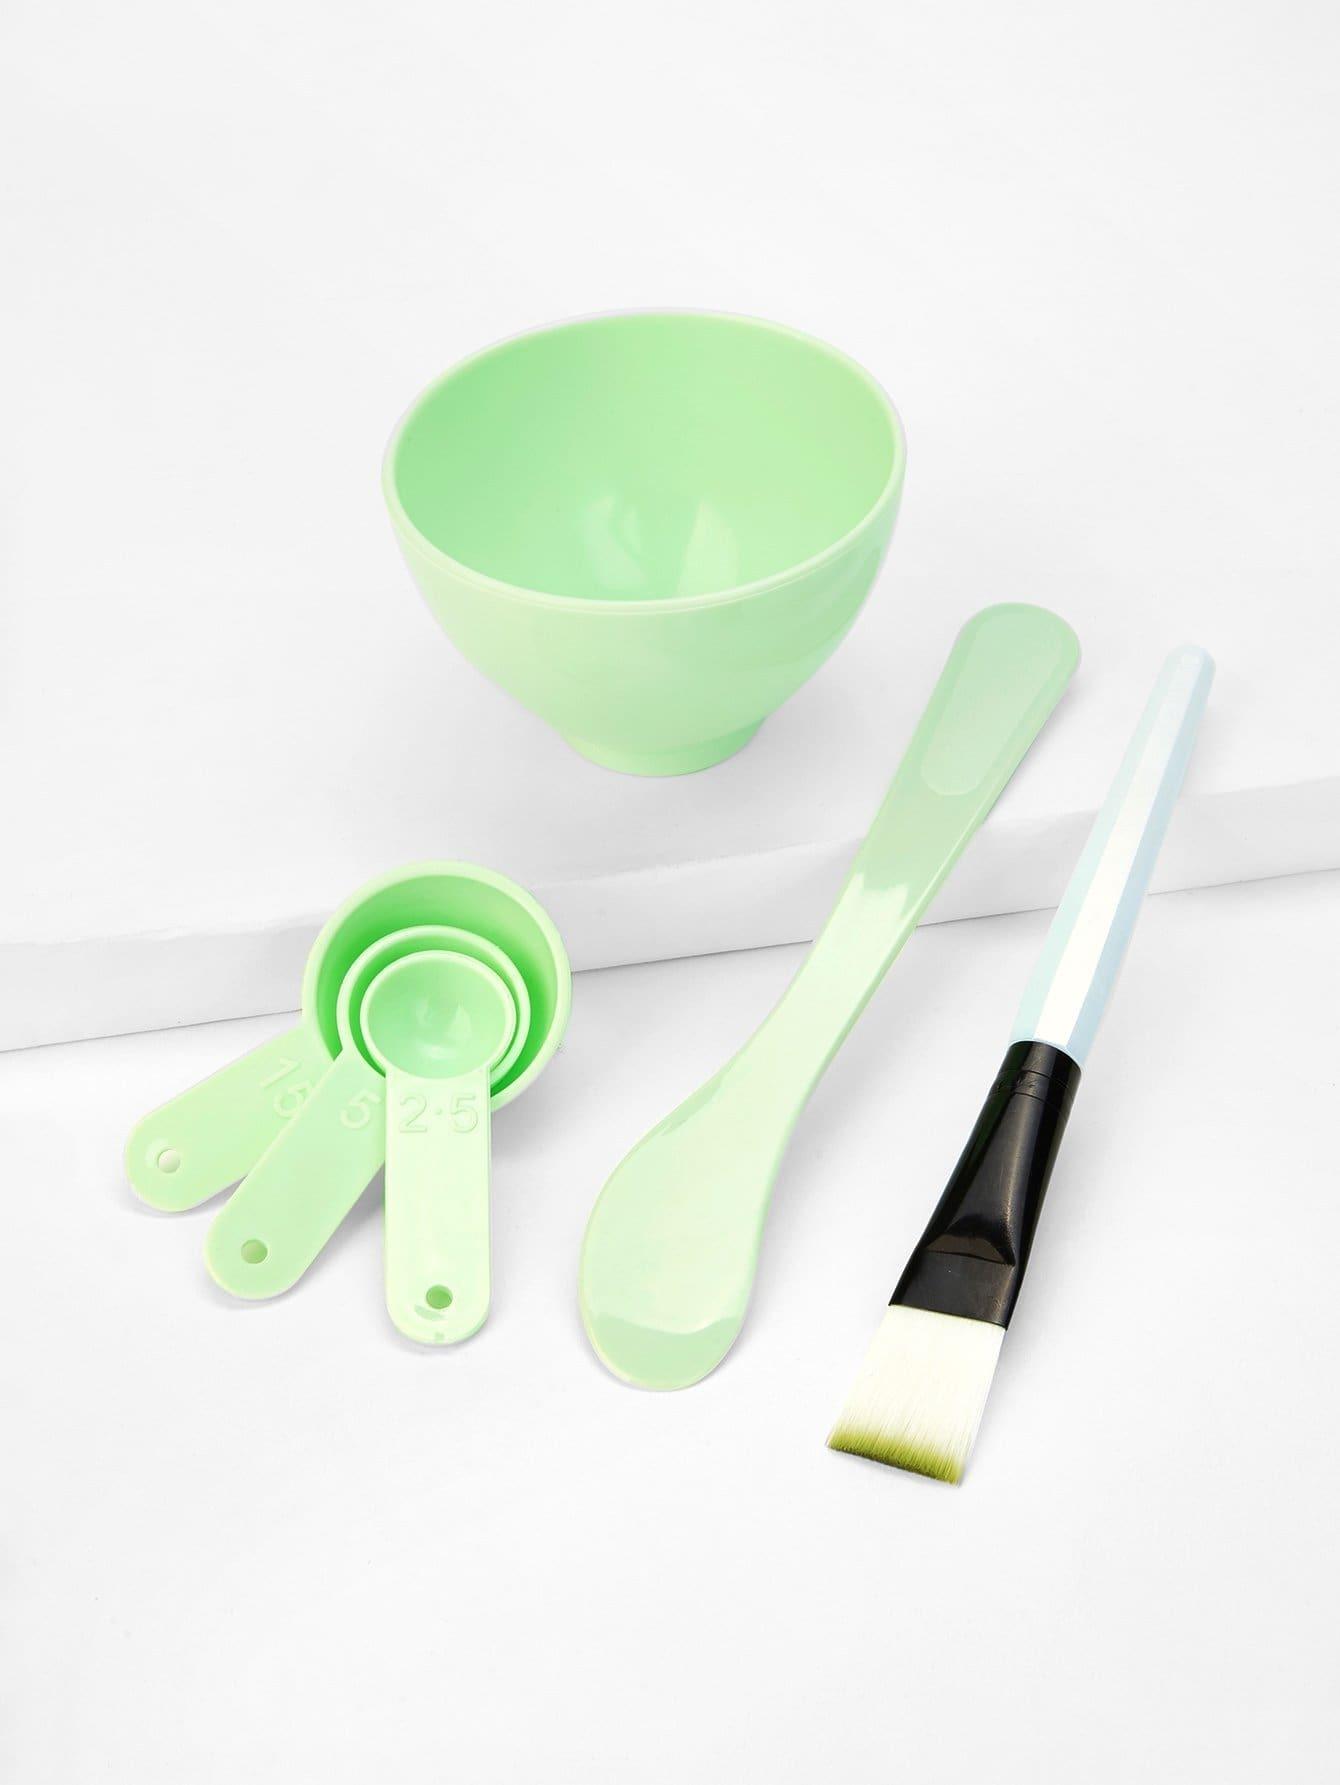 DIY Facial Mask Bowl 6pcs 4 in 1 diy facial mask maker set mixing bowl stick brush measuring spoons blue white